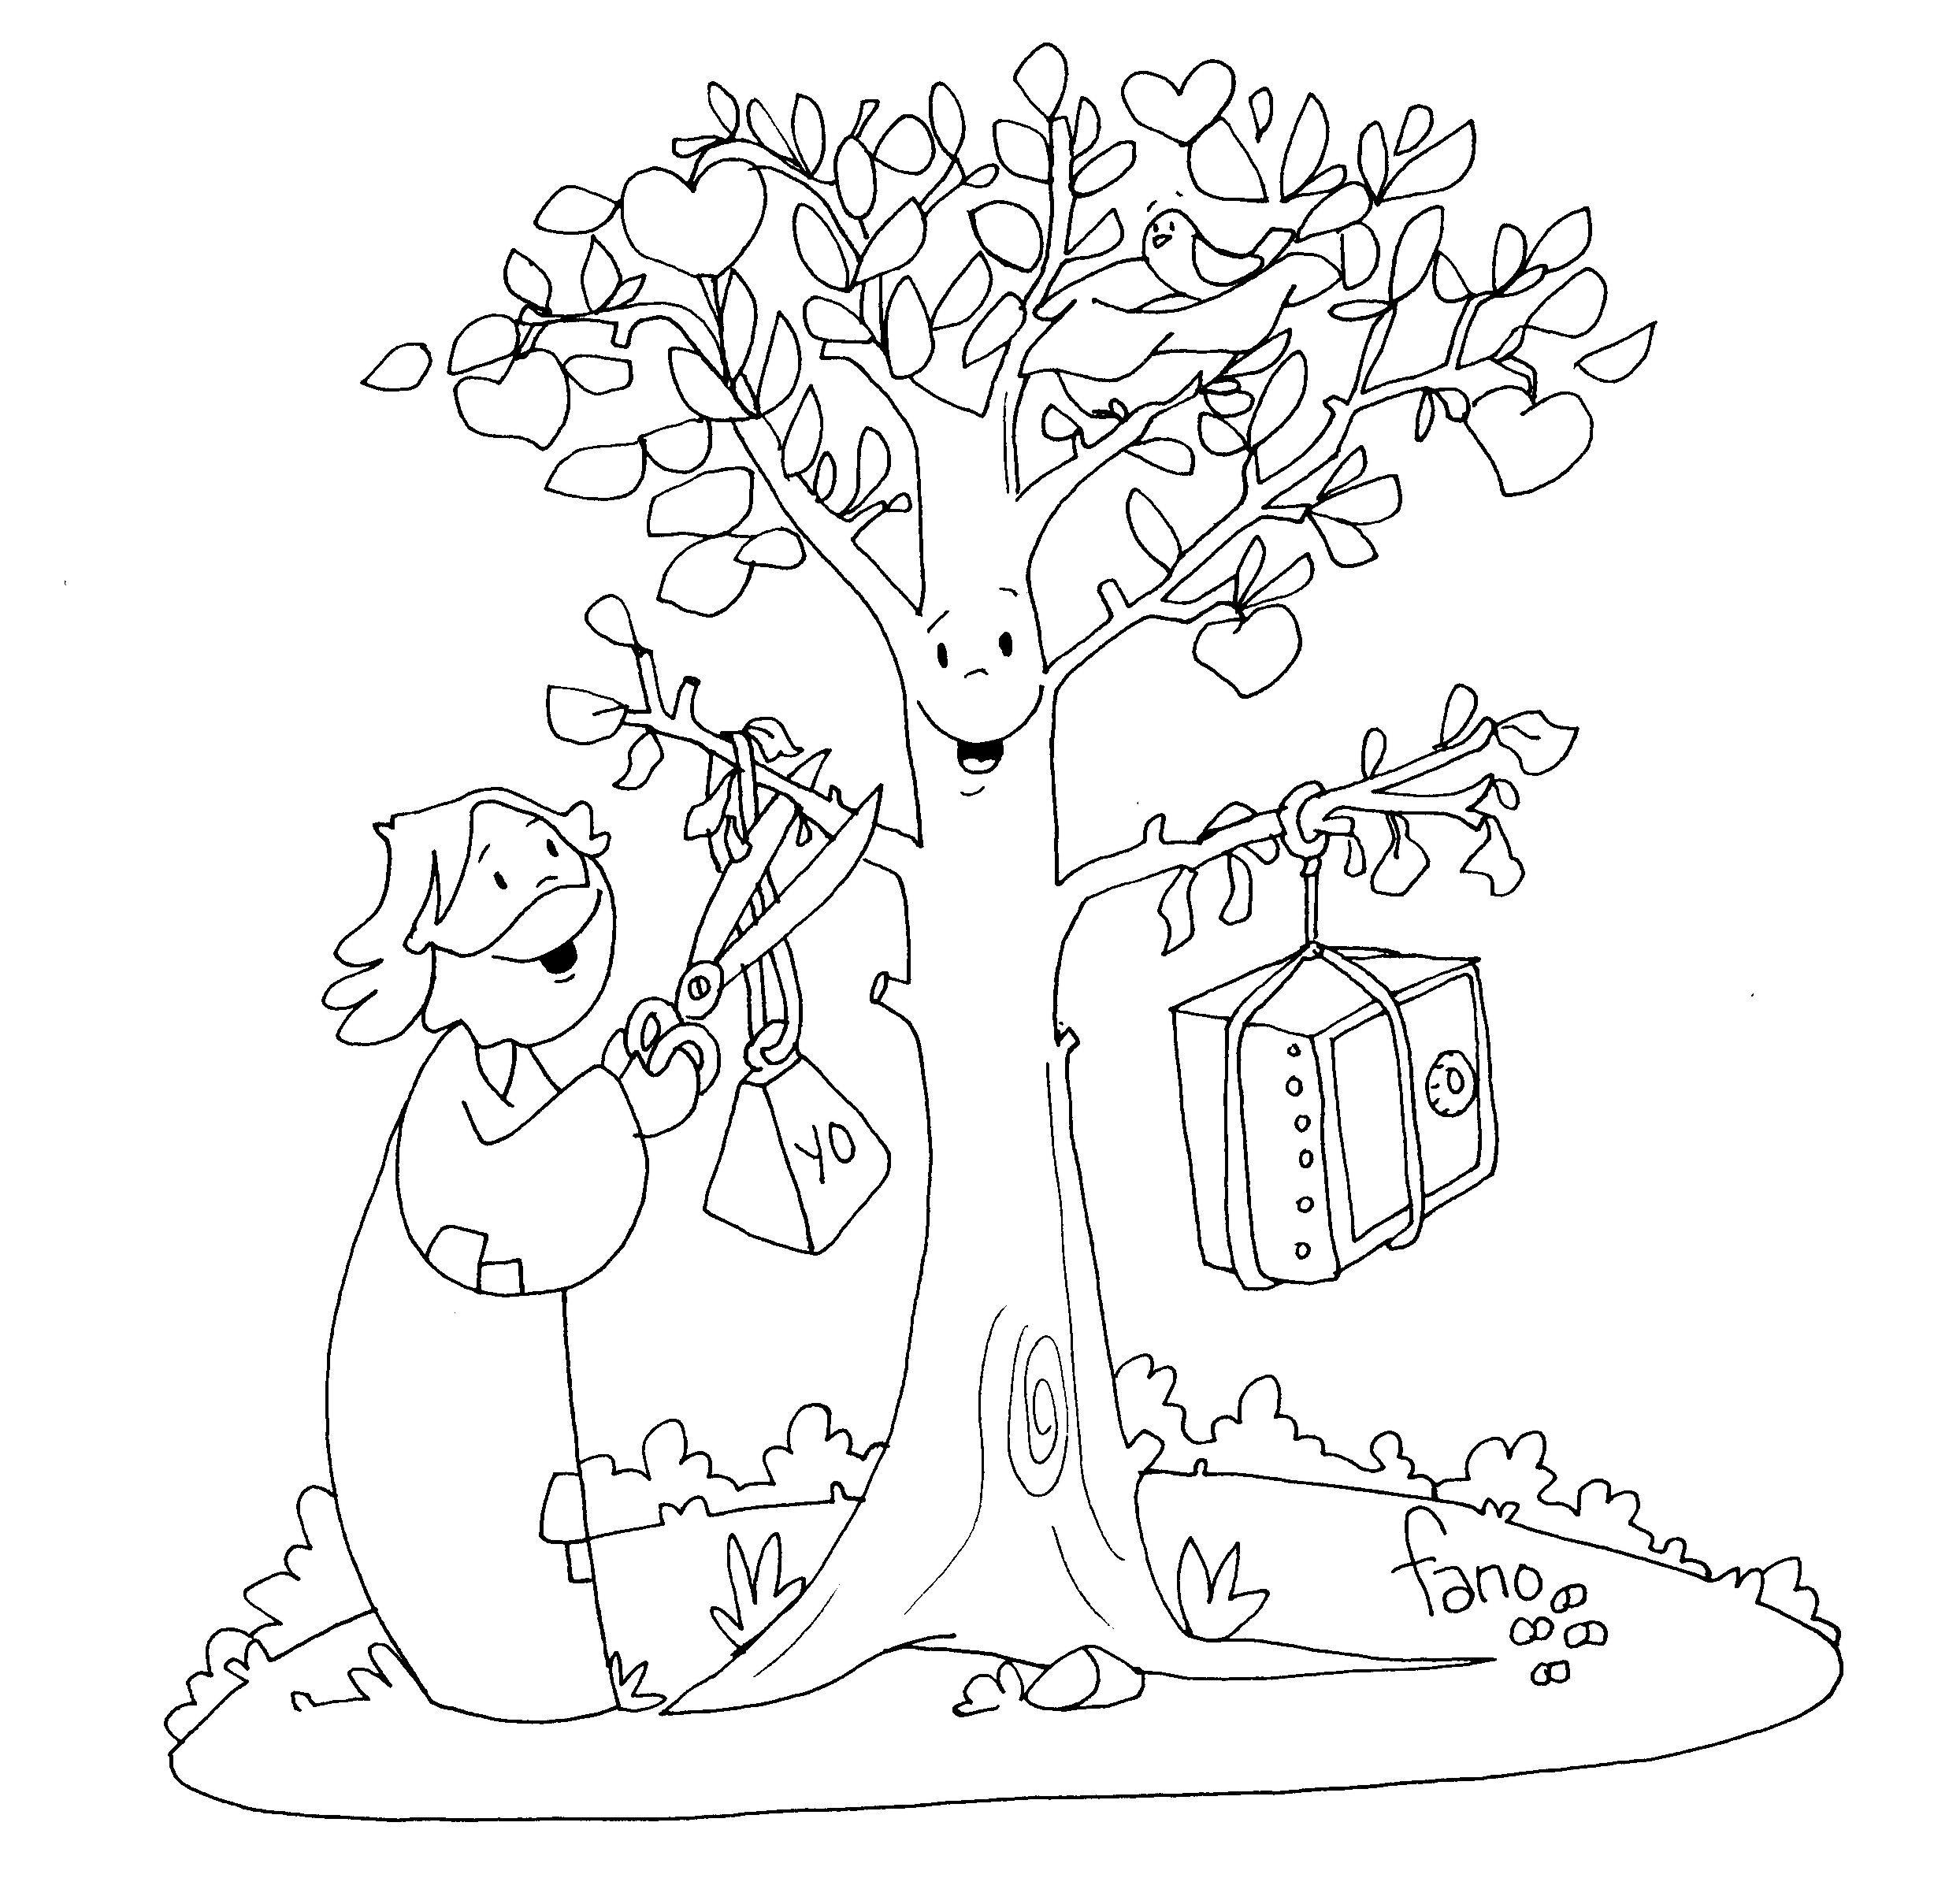 Zacchaeus coloring page | Sunday school coloring pages, Jesus ... | 2417x2488